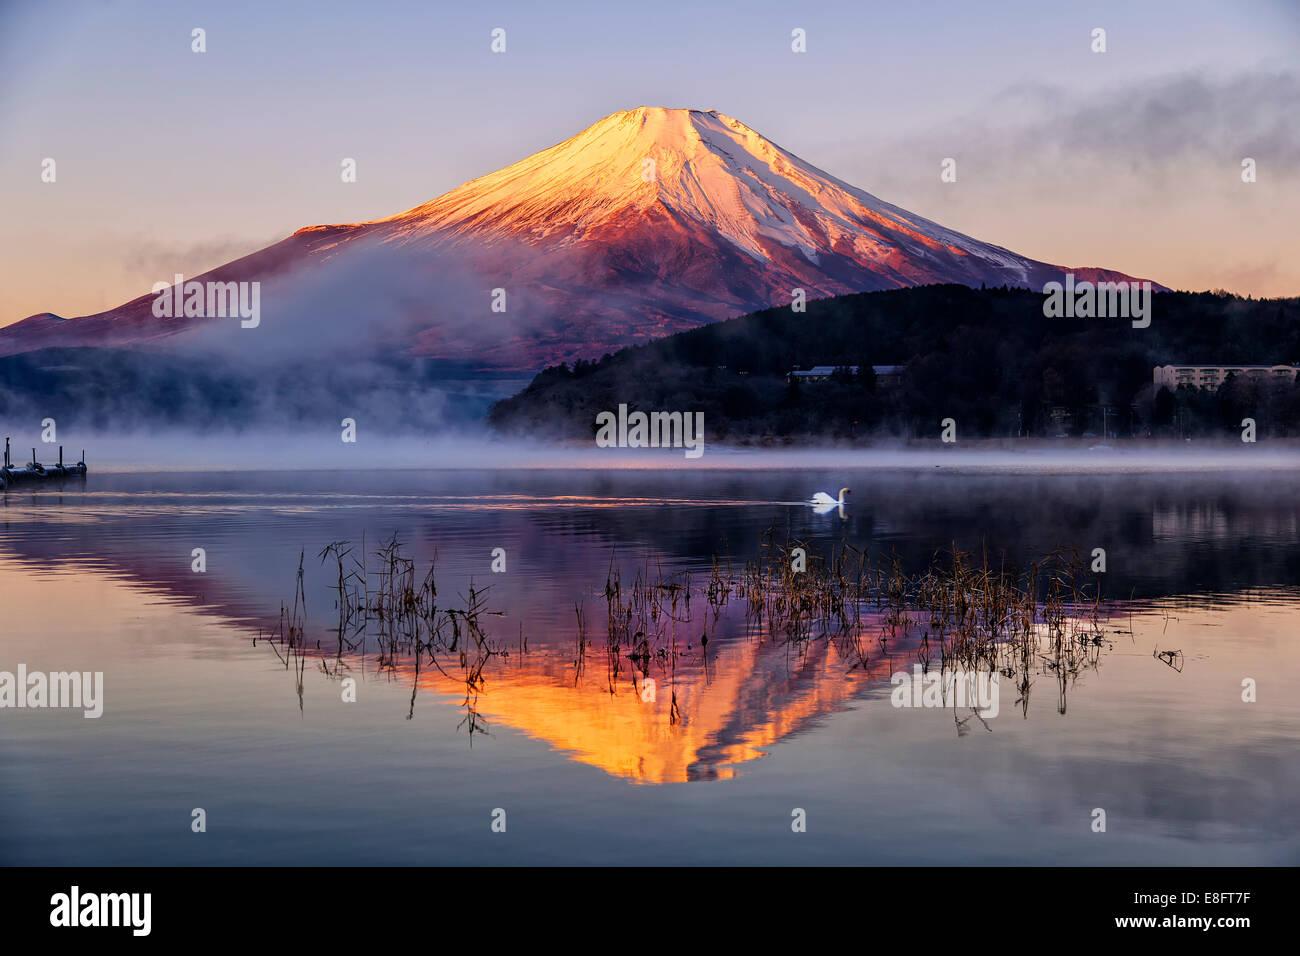 Japan, Mt.Fuji reflecting in Yamanaka lake - Stock Image